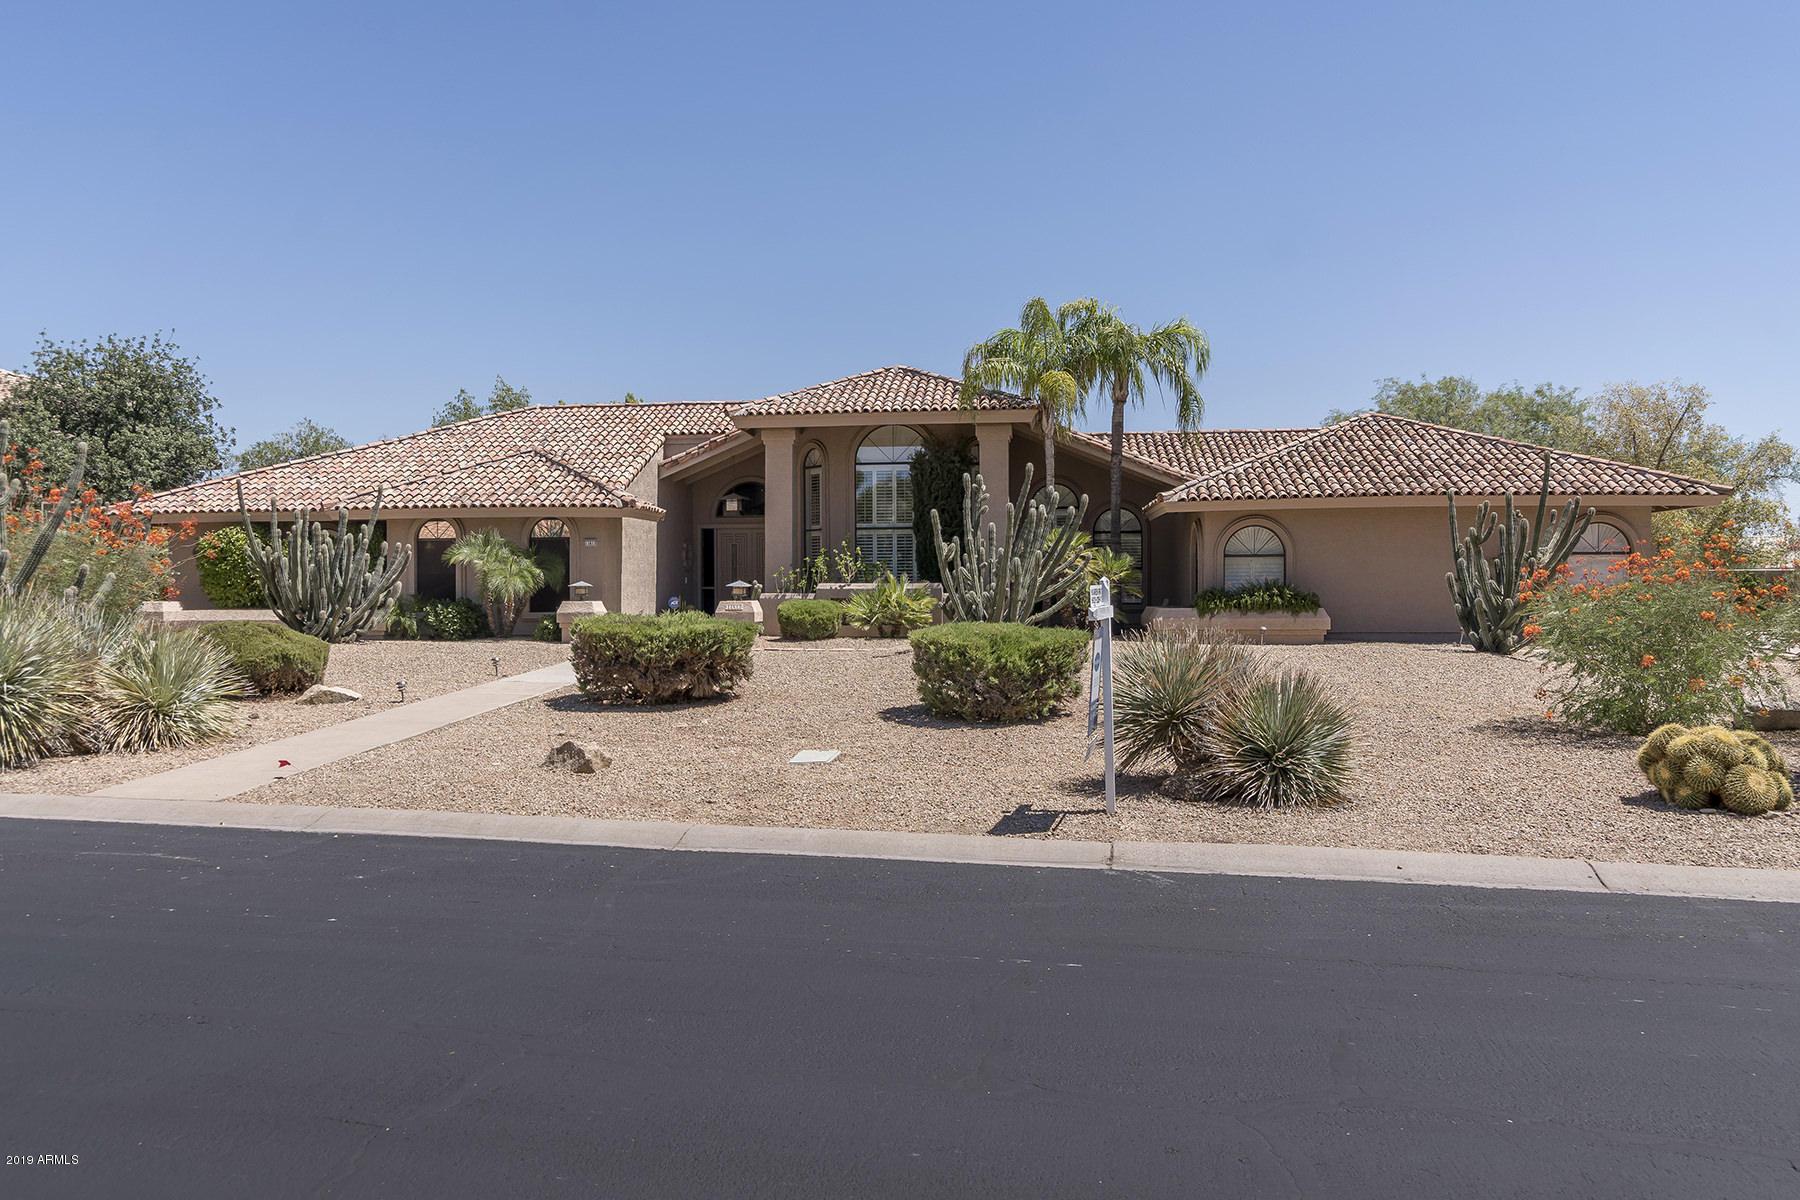 Photo of 11813 E BERYL Avenue, Scottsdale, AZ 85259